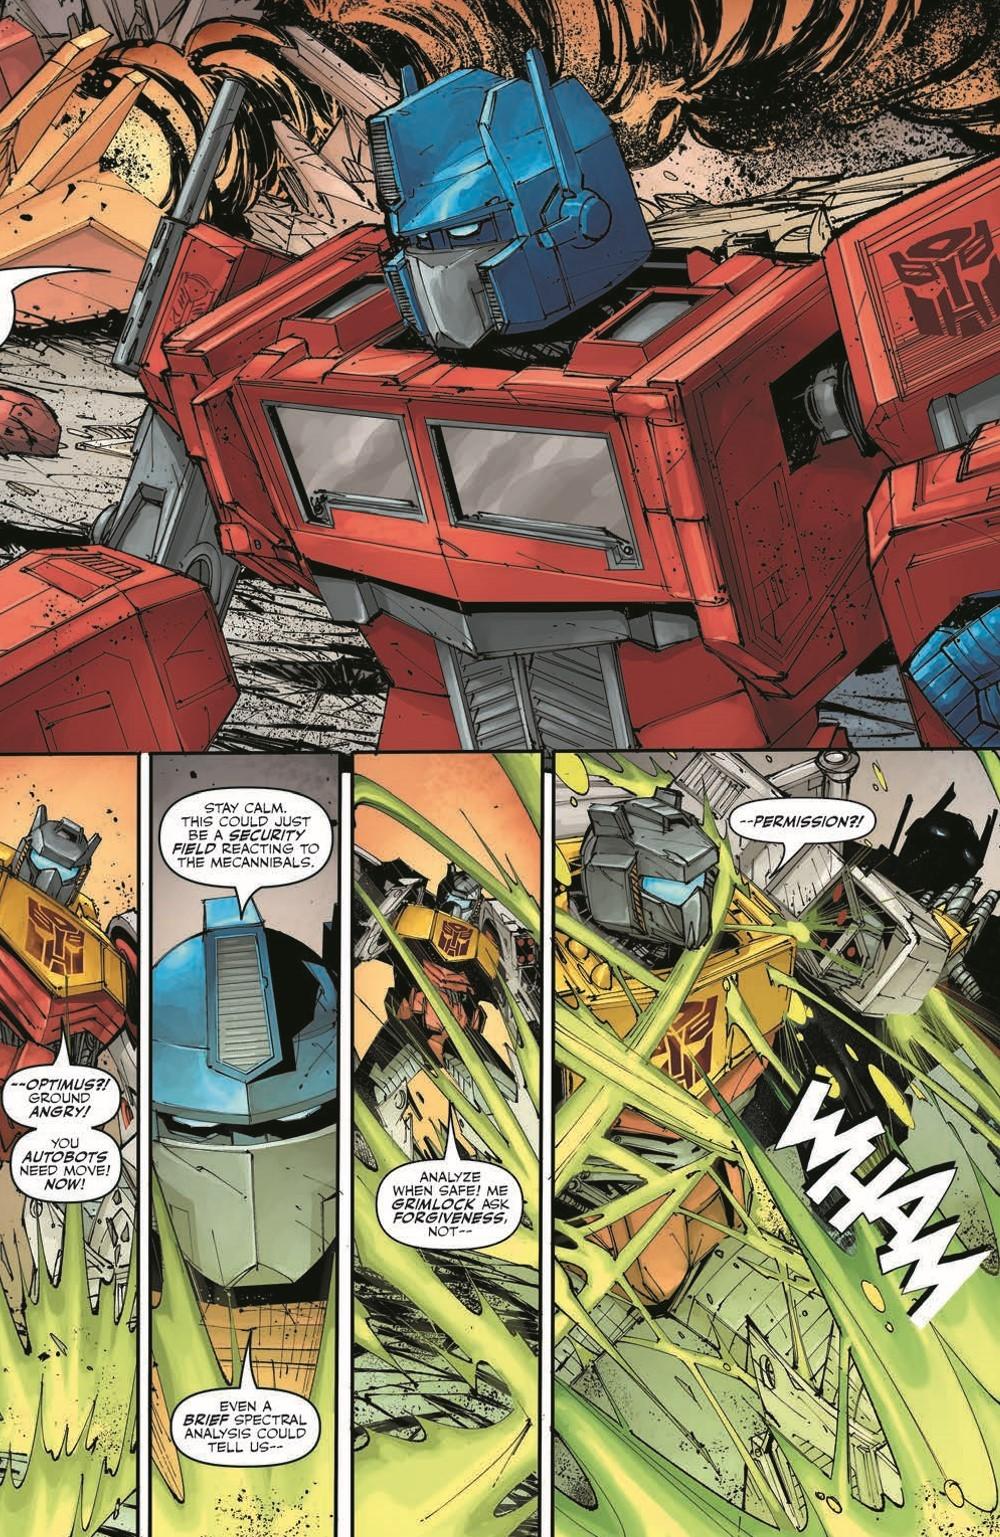 TFKingGrimlock01_pr-5 ComicList Previews: TRANSFORMERS KING GRIMLOCK #1 (OF 5)